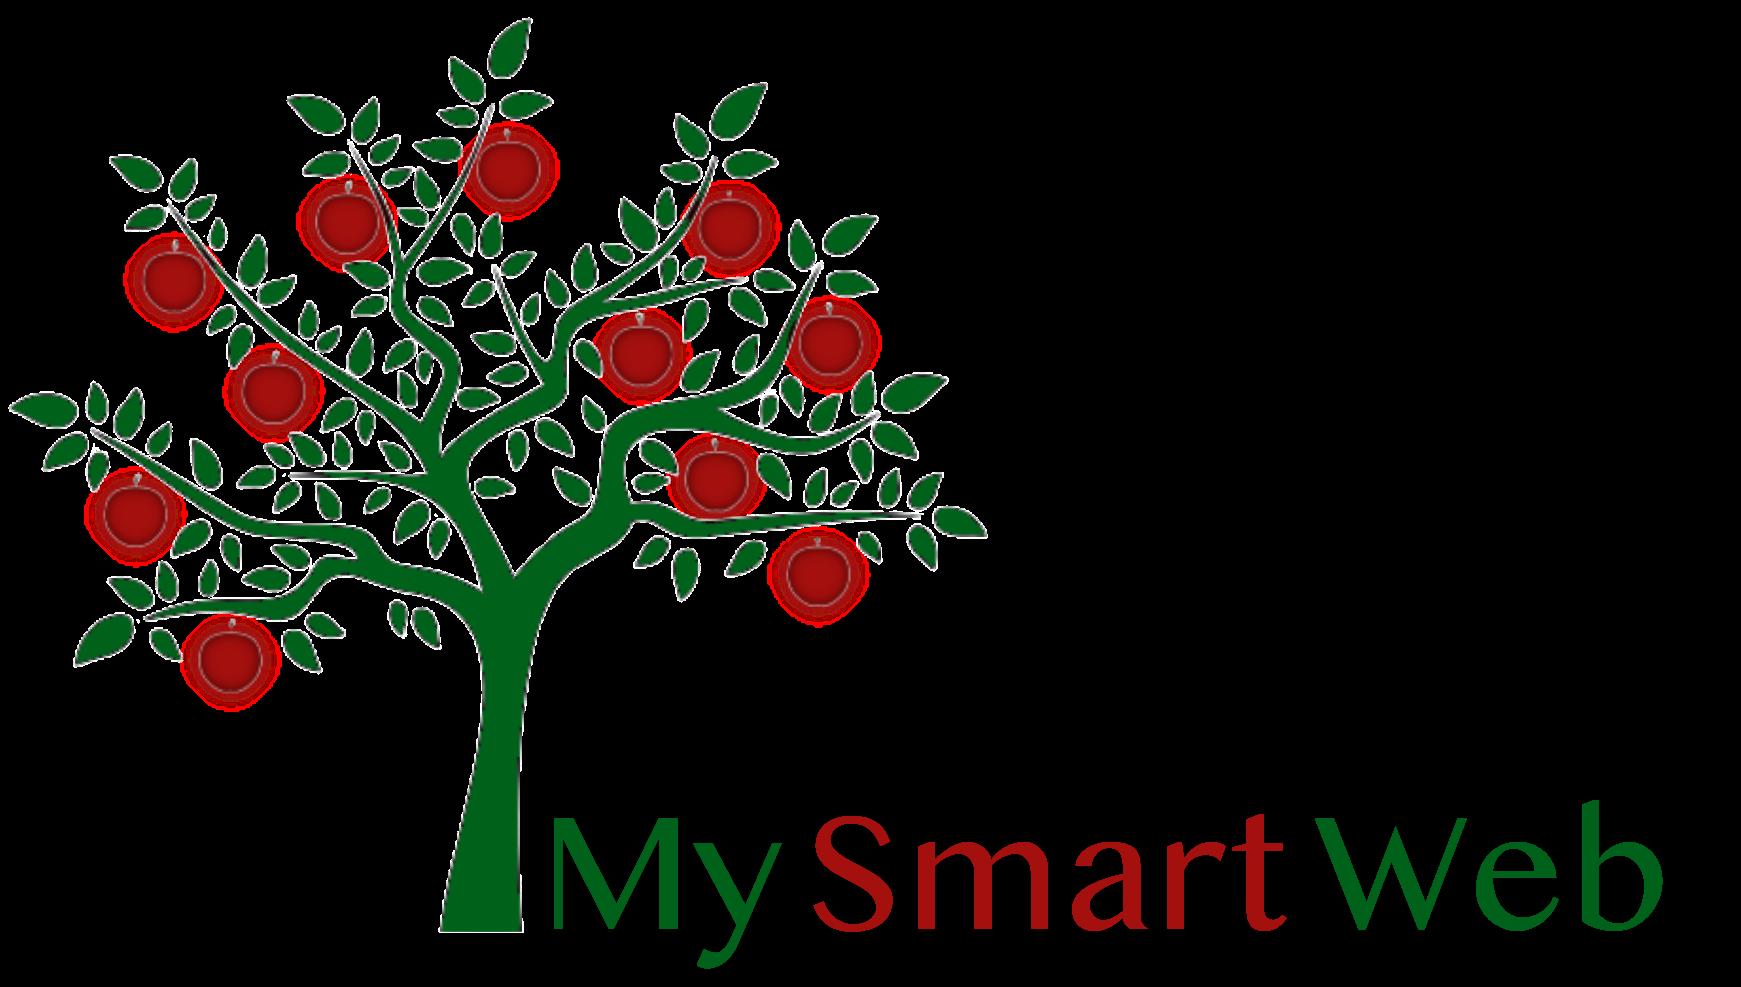 My Smart Web